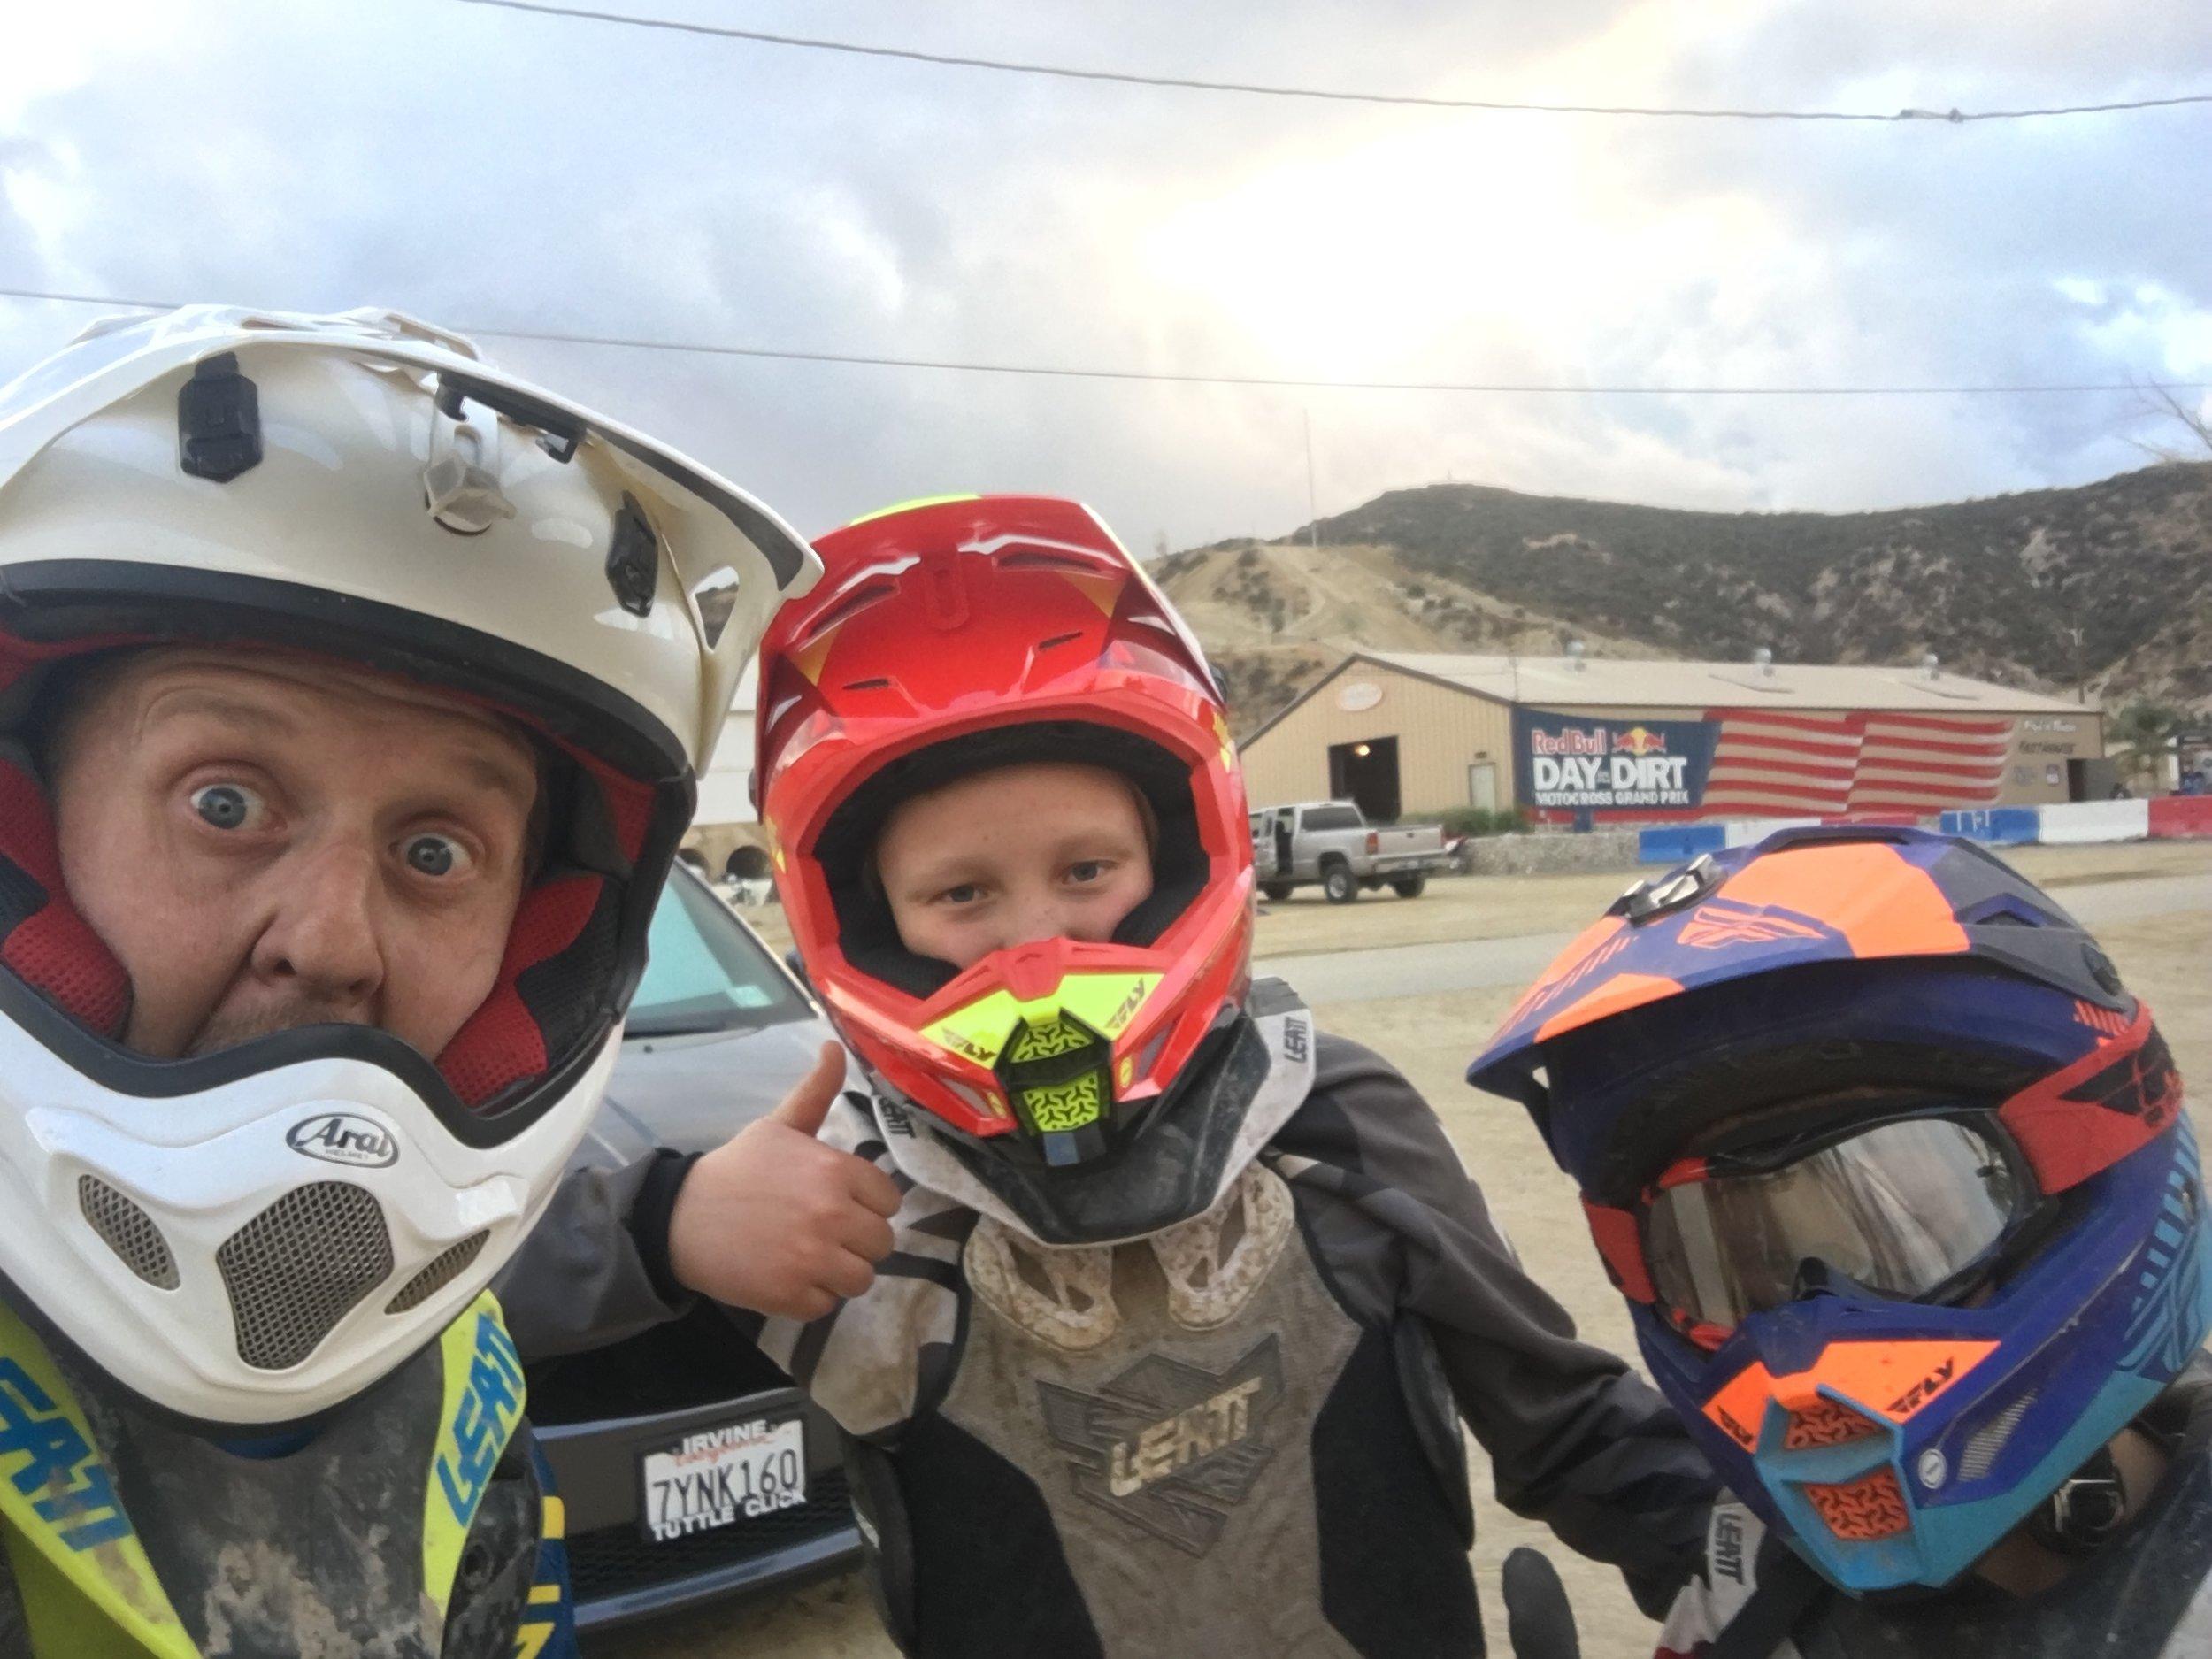 Selfie with helmets